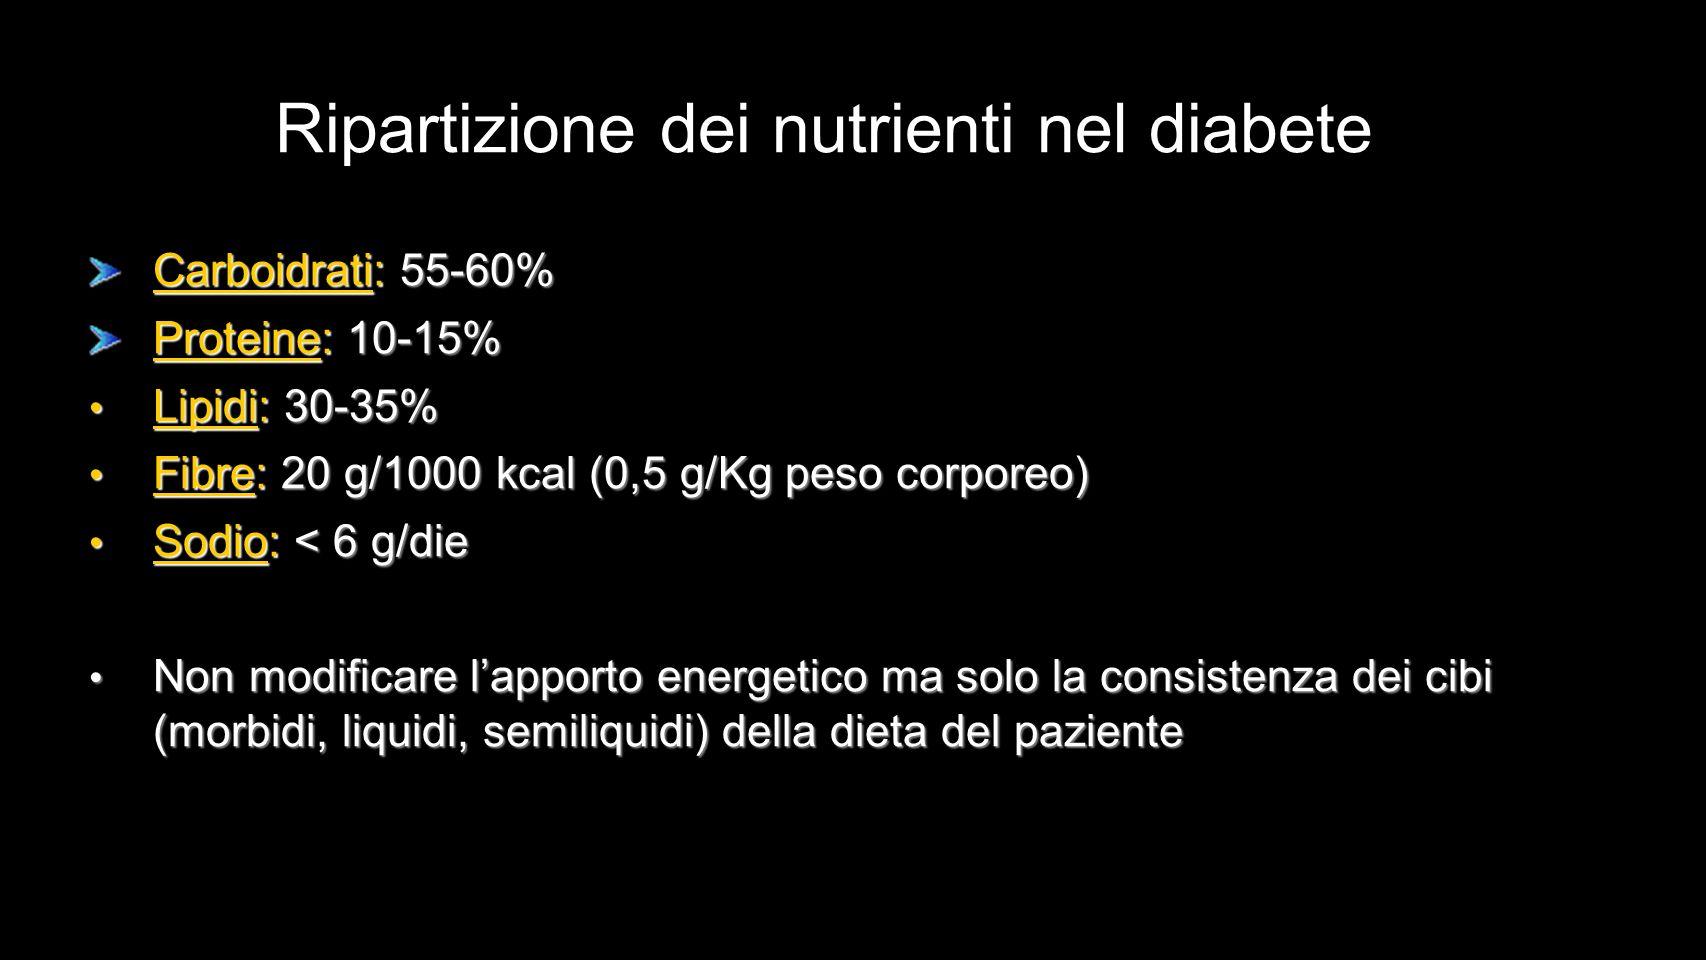 Carboidrati: 55-60% Proteine: 10-15% Lipidi: 30-35% Lipidi: 30-35% Fibre: 20 g/1000 kcal (0,5 g/Kg peso corporeo) Fibre: 20 g/1000 kcal (0,5 g/Kg peso